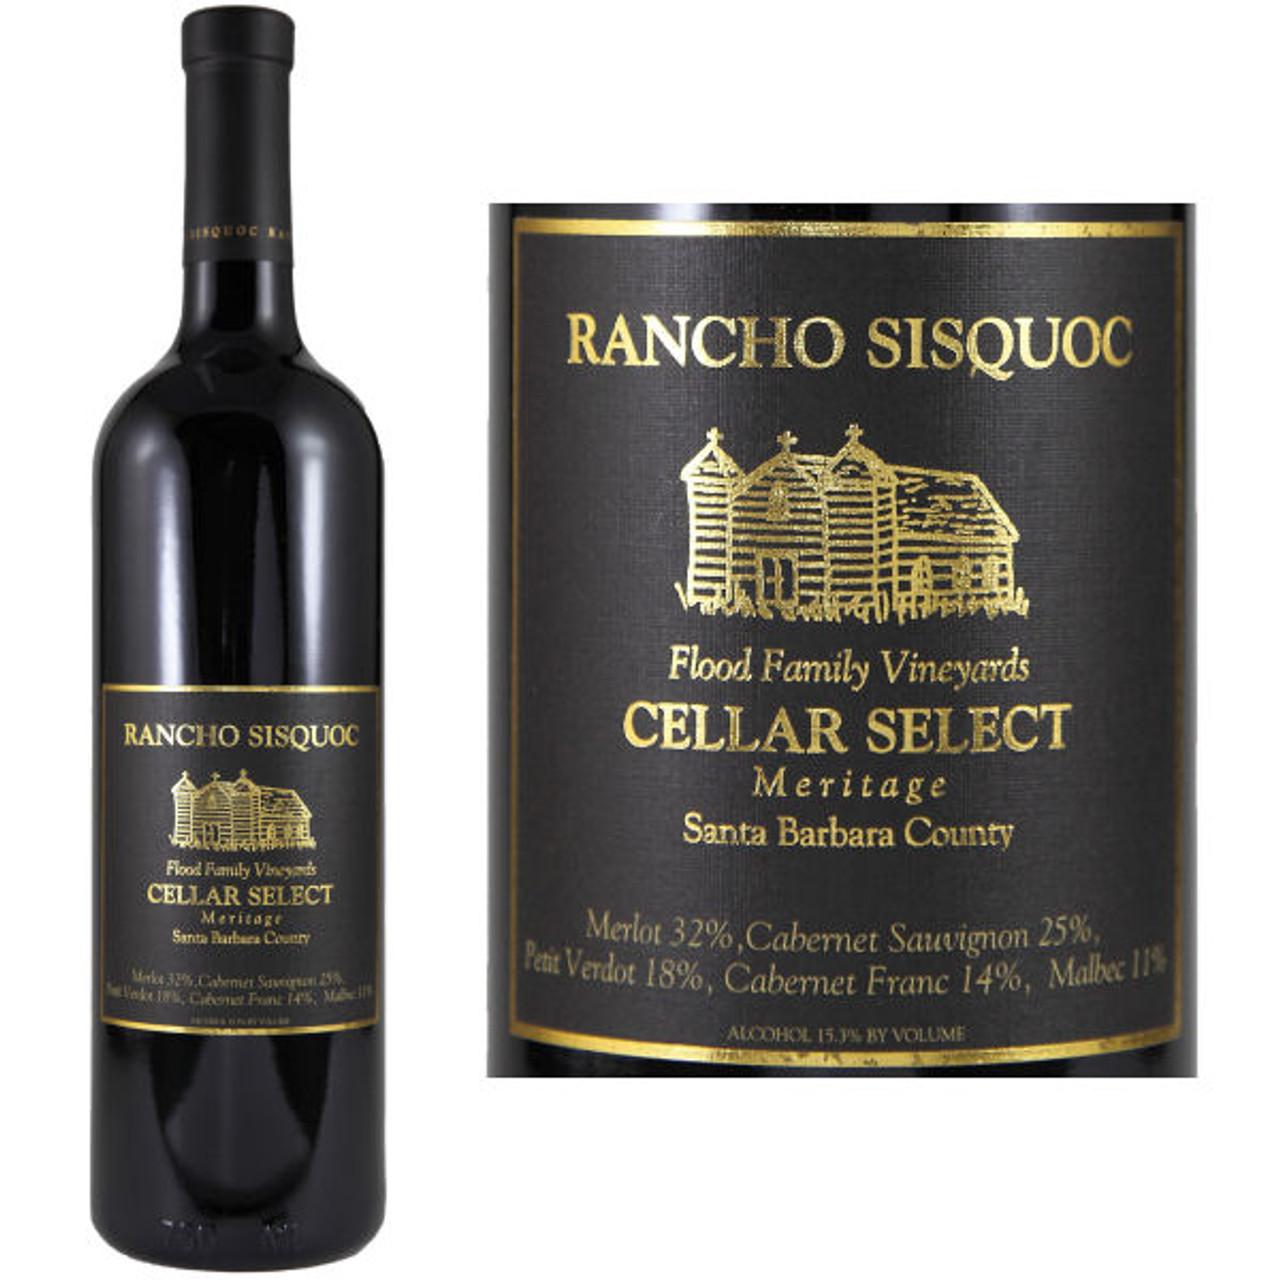 Rancho Sisquoc Cellar Select Meritage